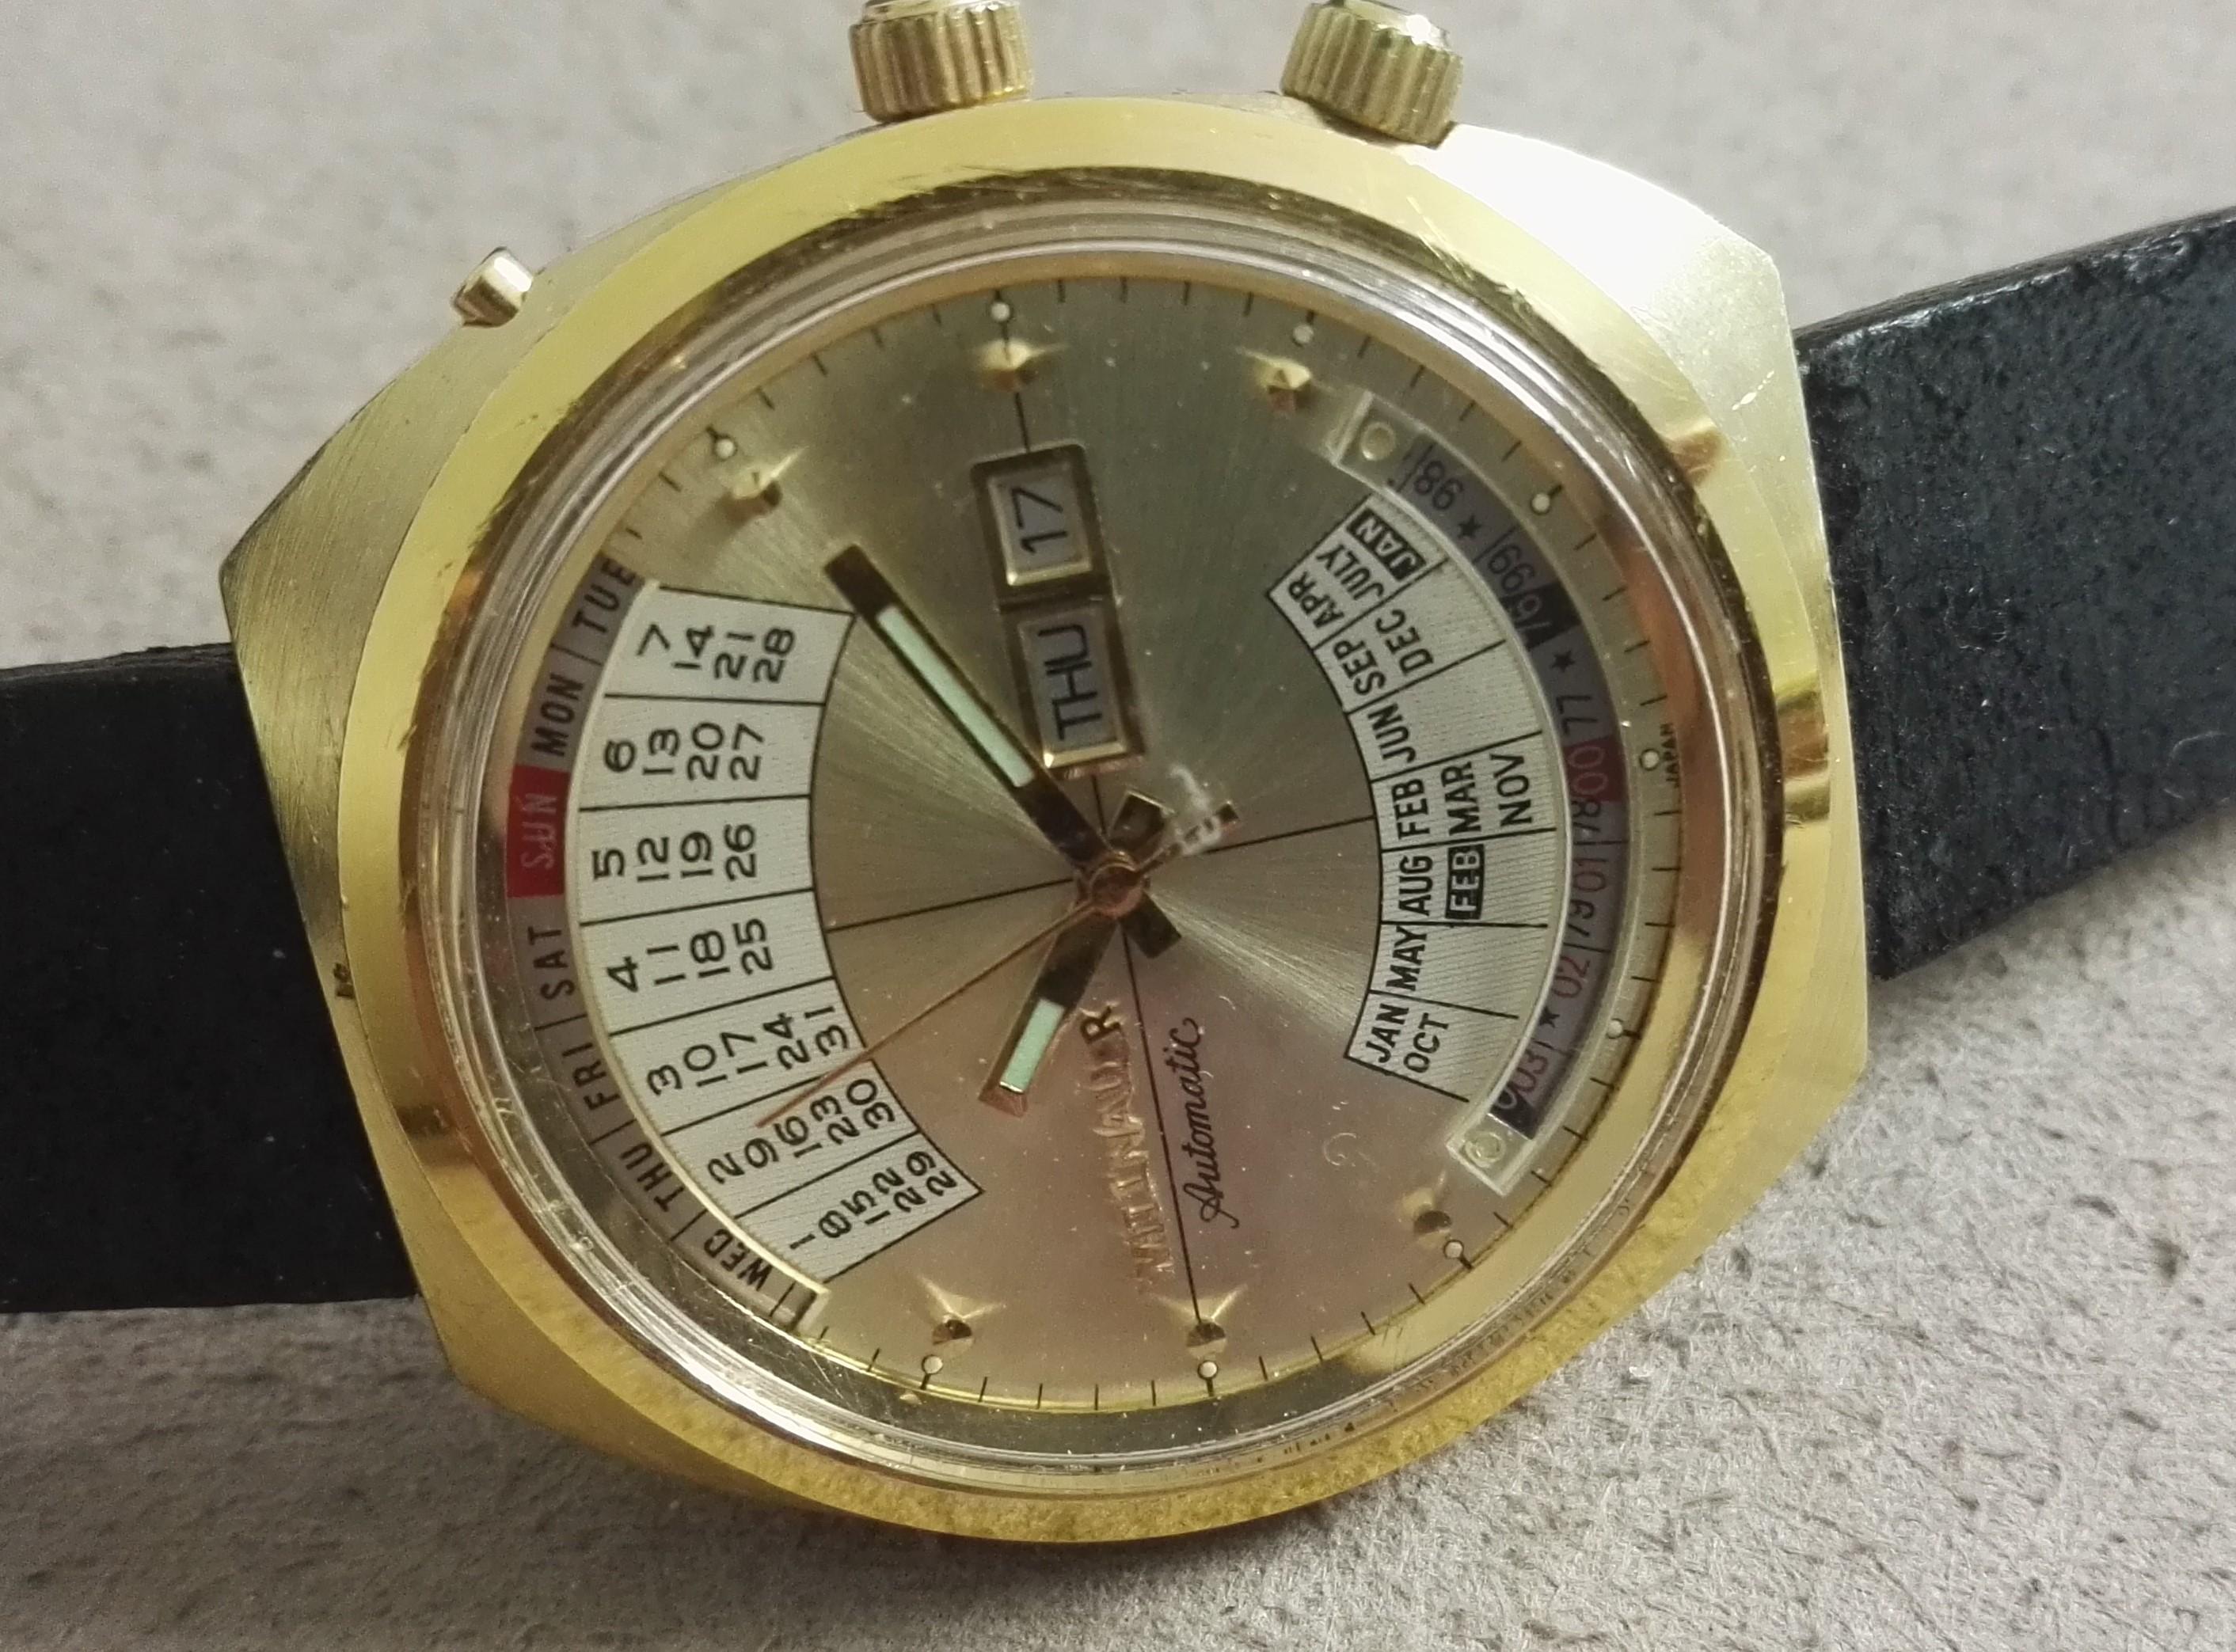 Wittnauer 2002 Automatic Gold Dial Day-Date Calendar Watch - box | San Giorgio a Cremano